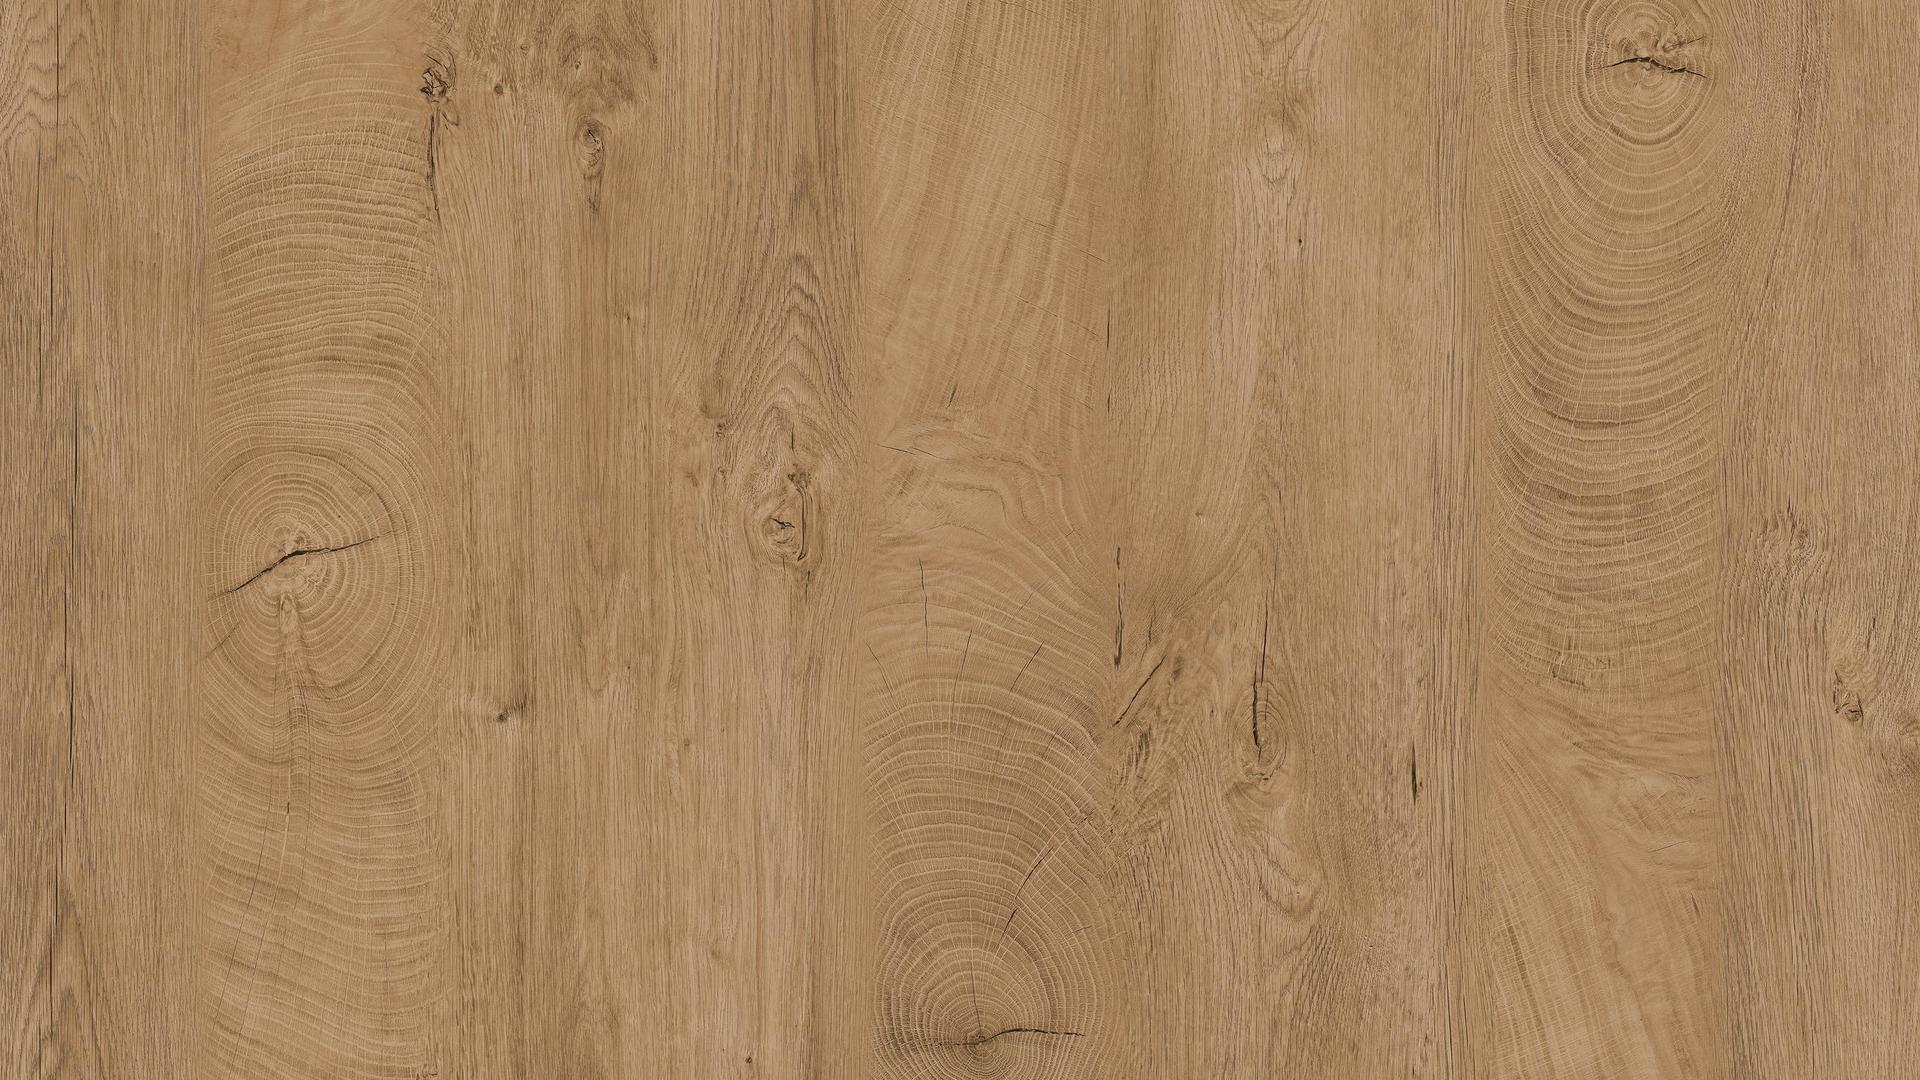 Placă decorativă Kaindl Stejar Elegance K5414 RO RO Decor 2